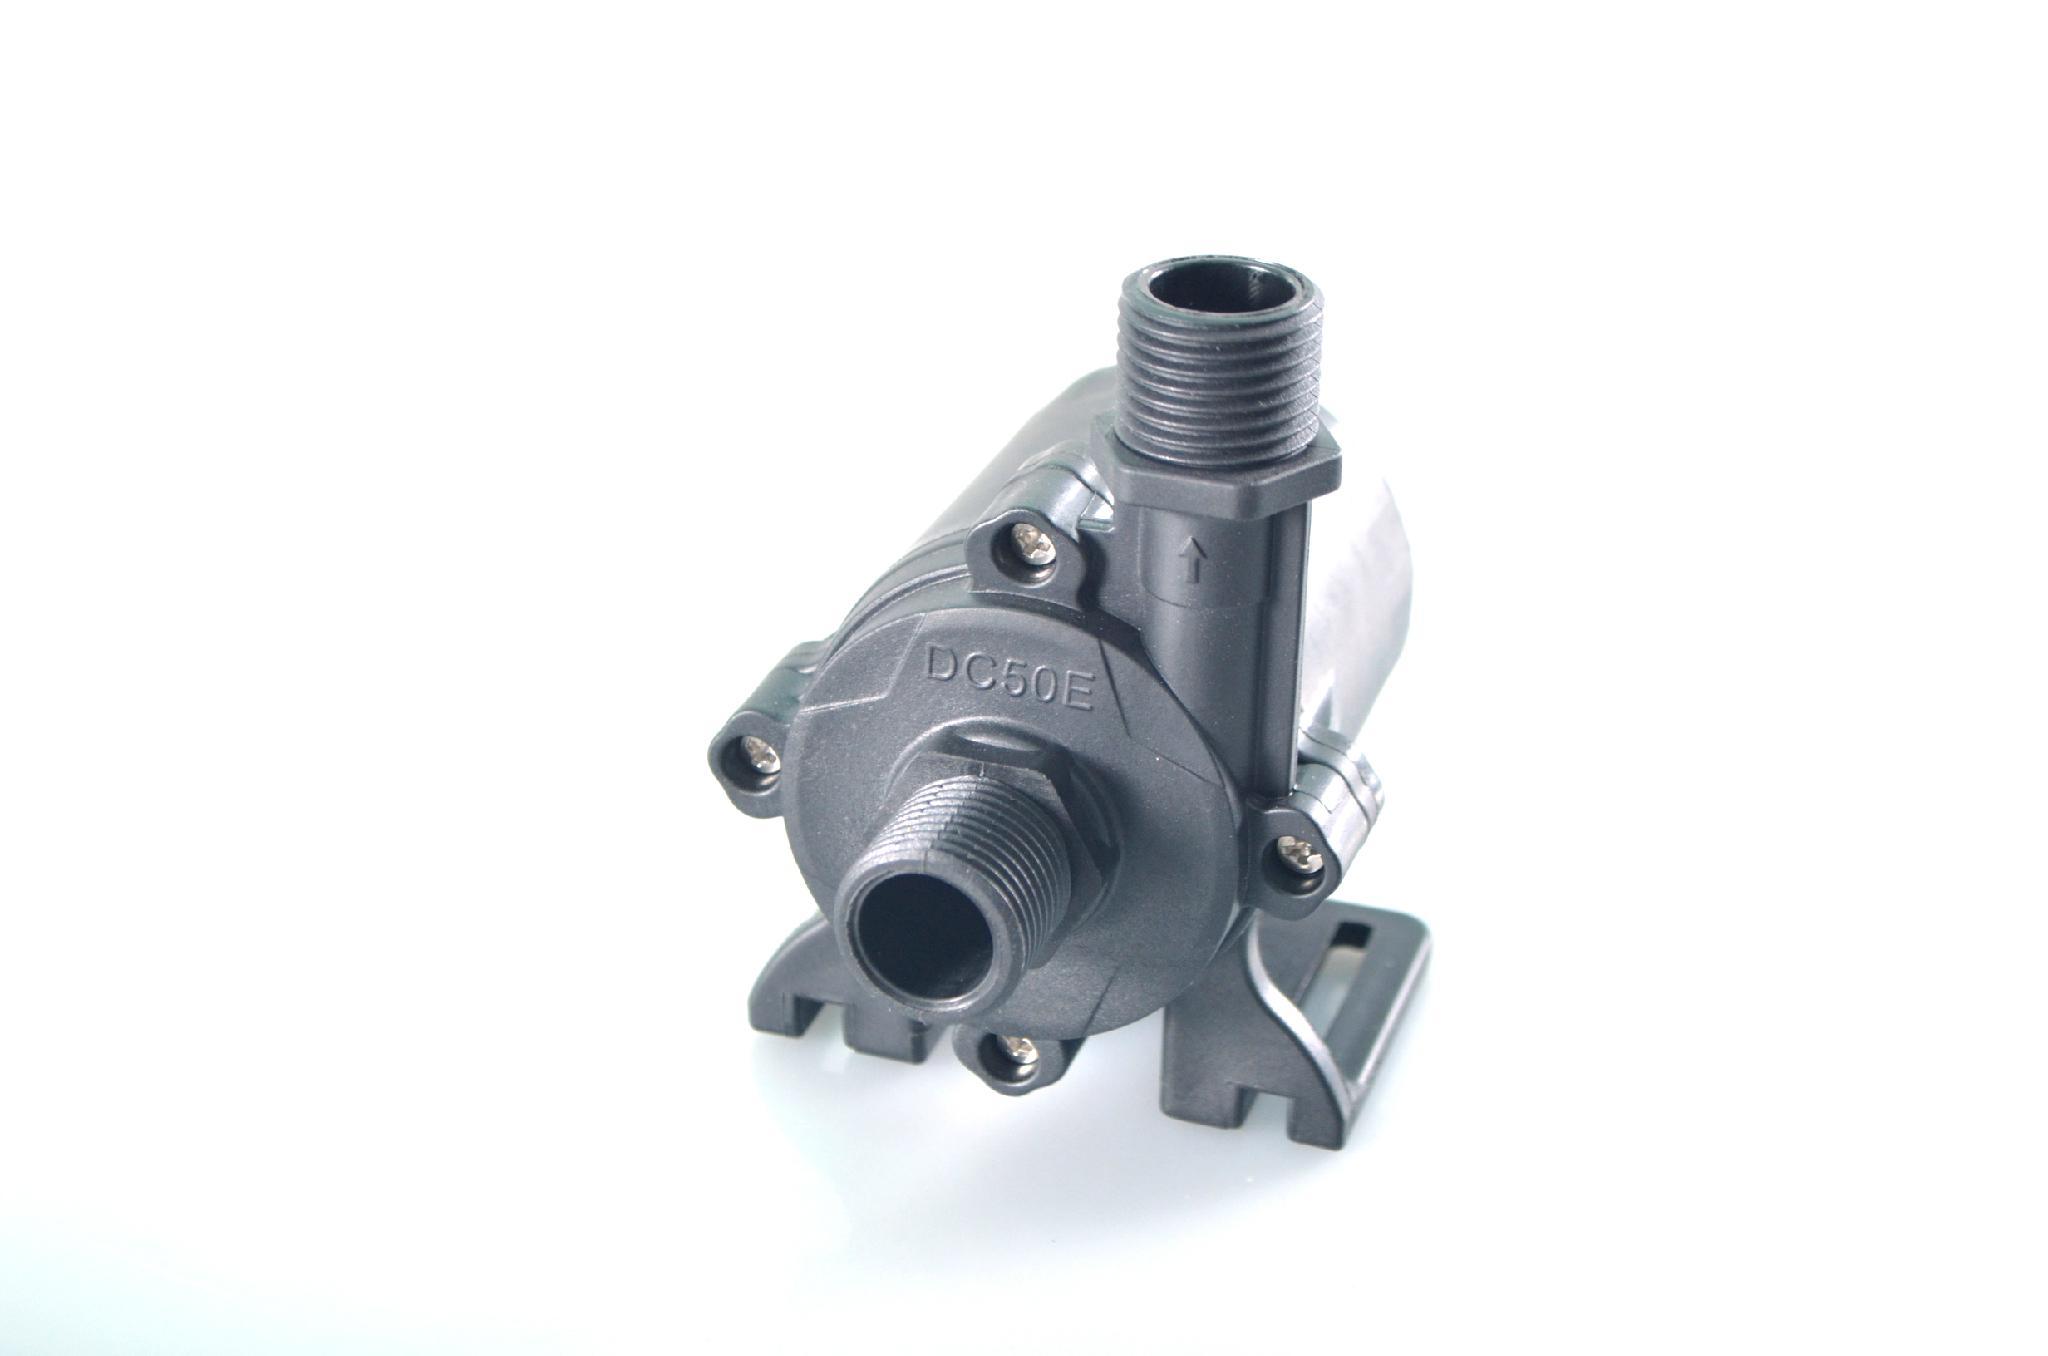 Solar dc hot water circulation pump brushless motor water for Dc motor water pump